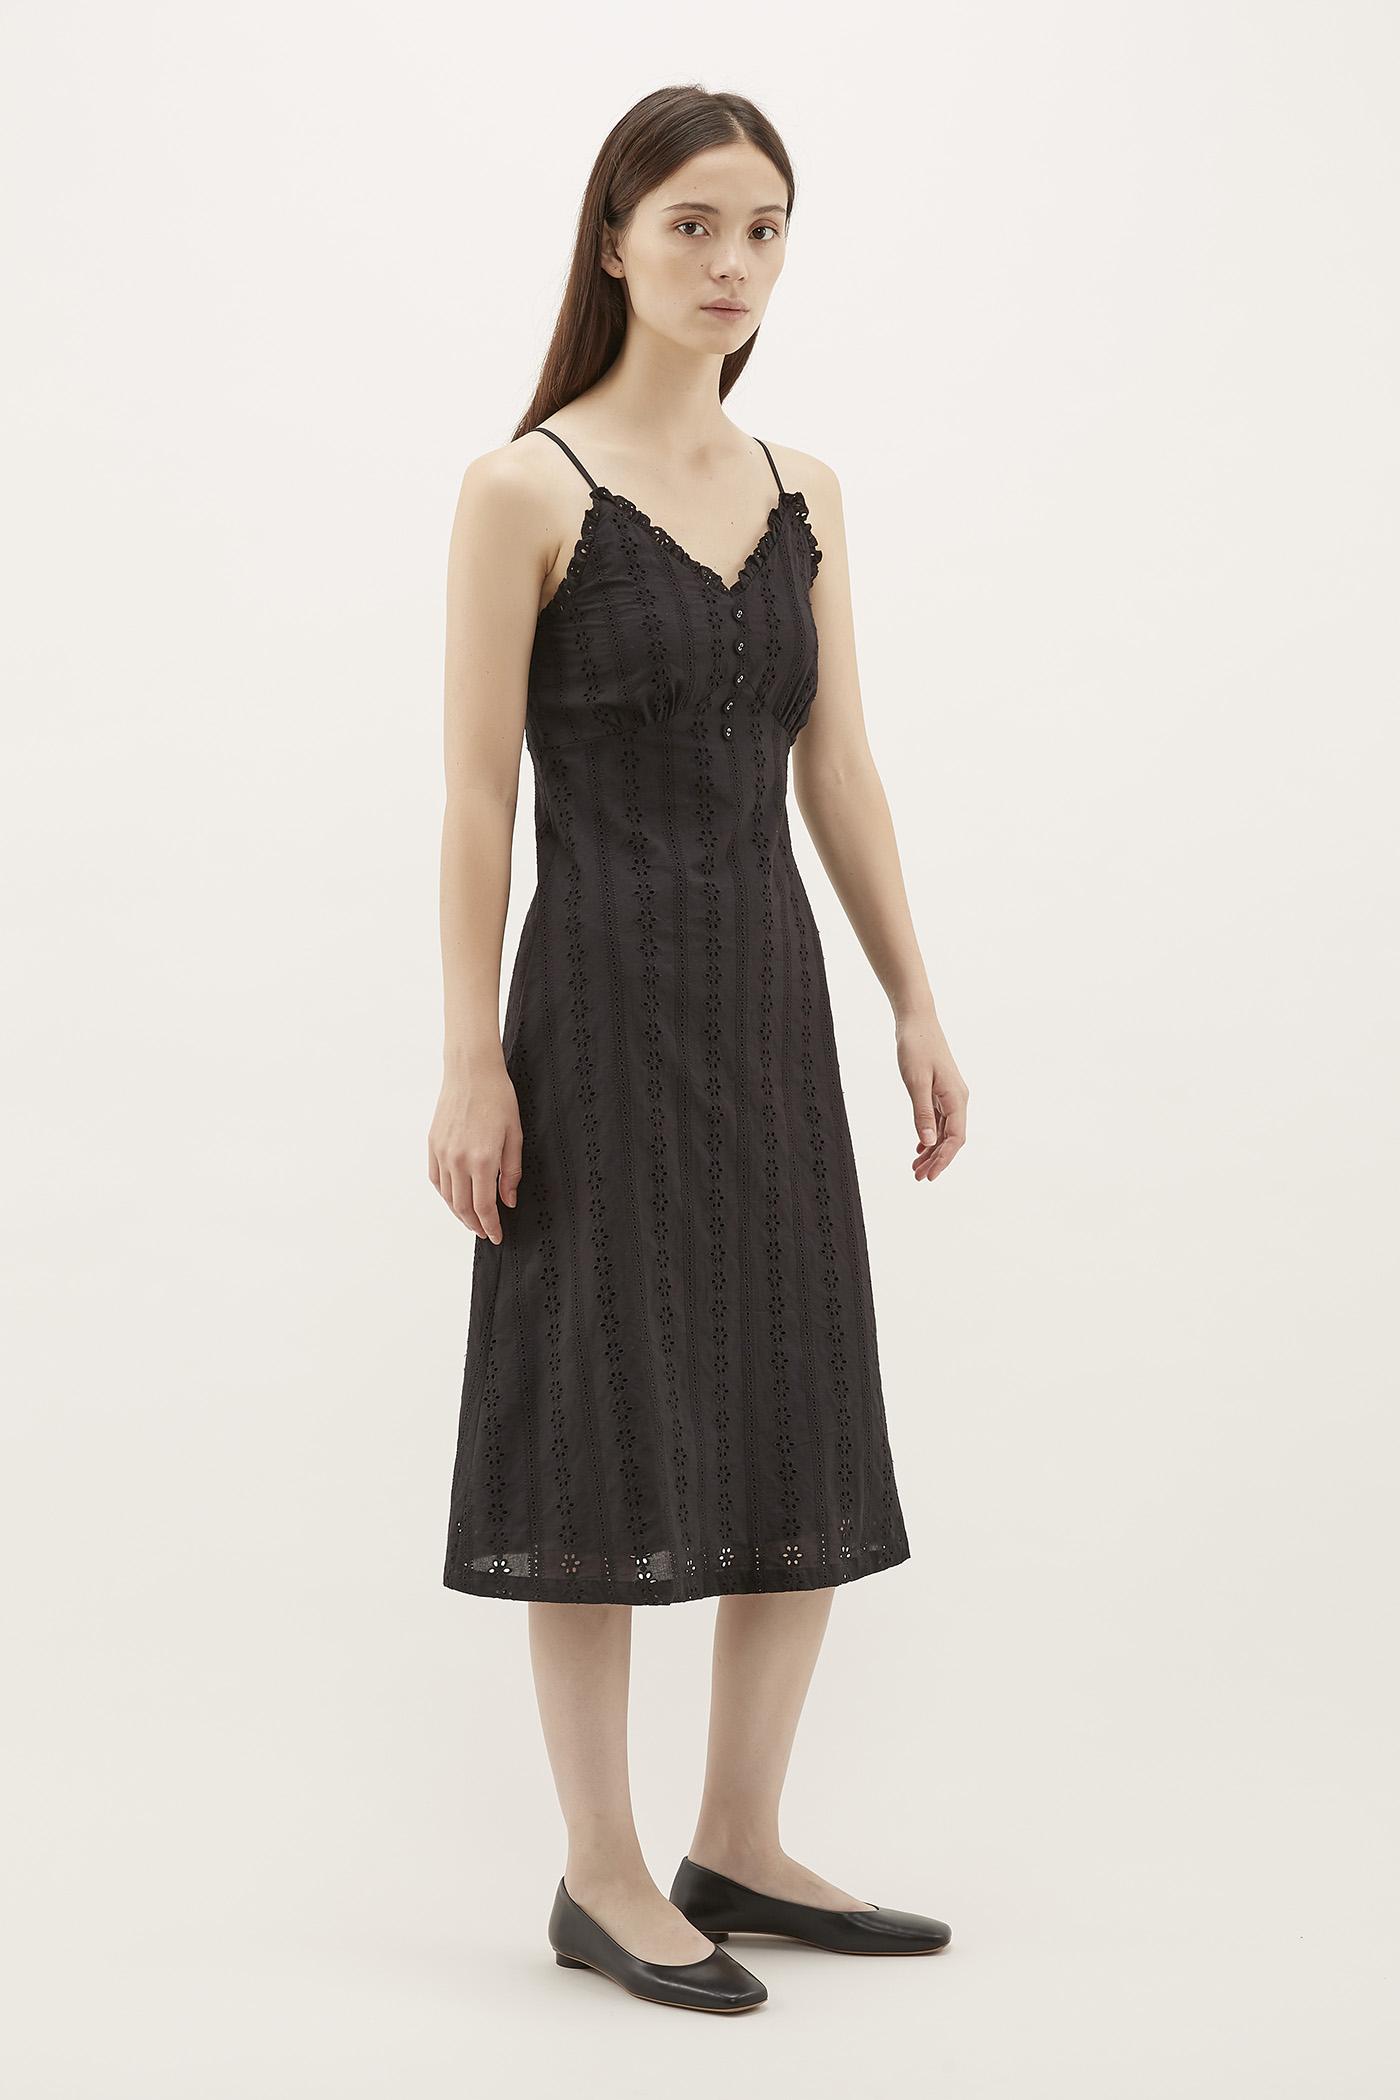 Bevy Broderie Midi Dress